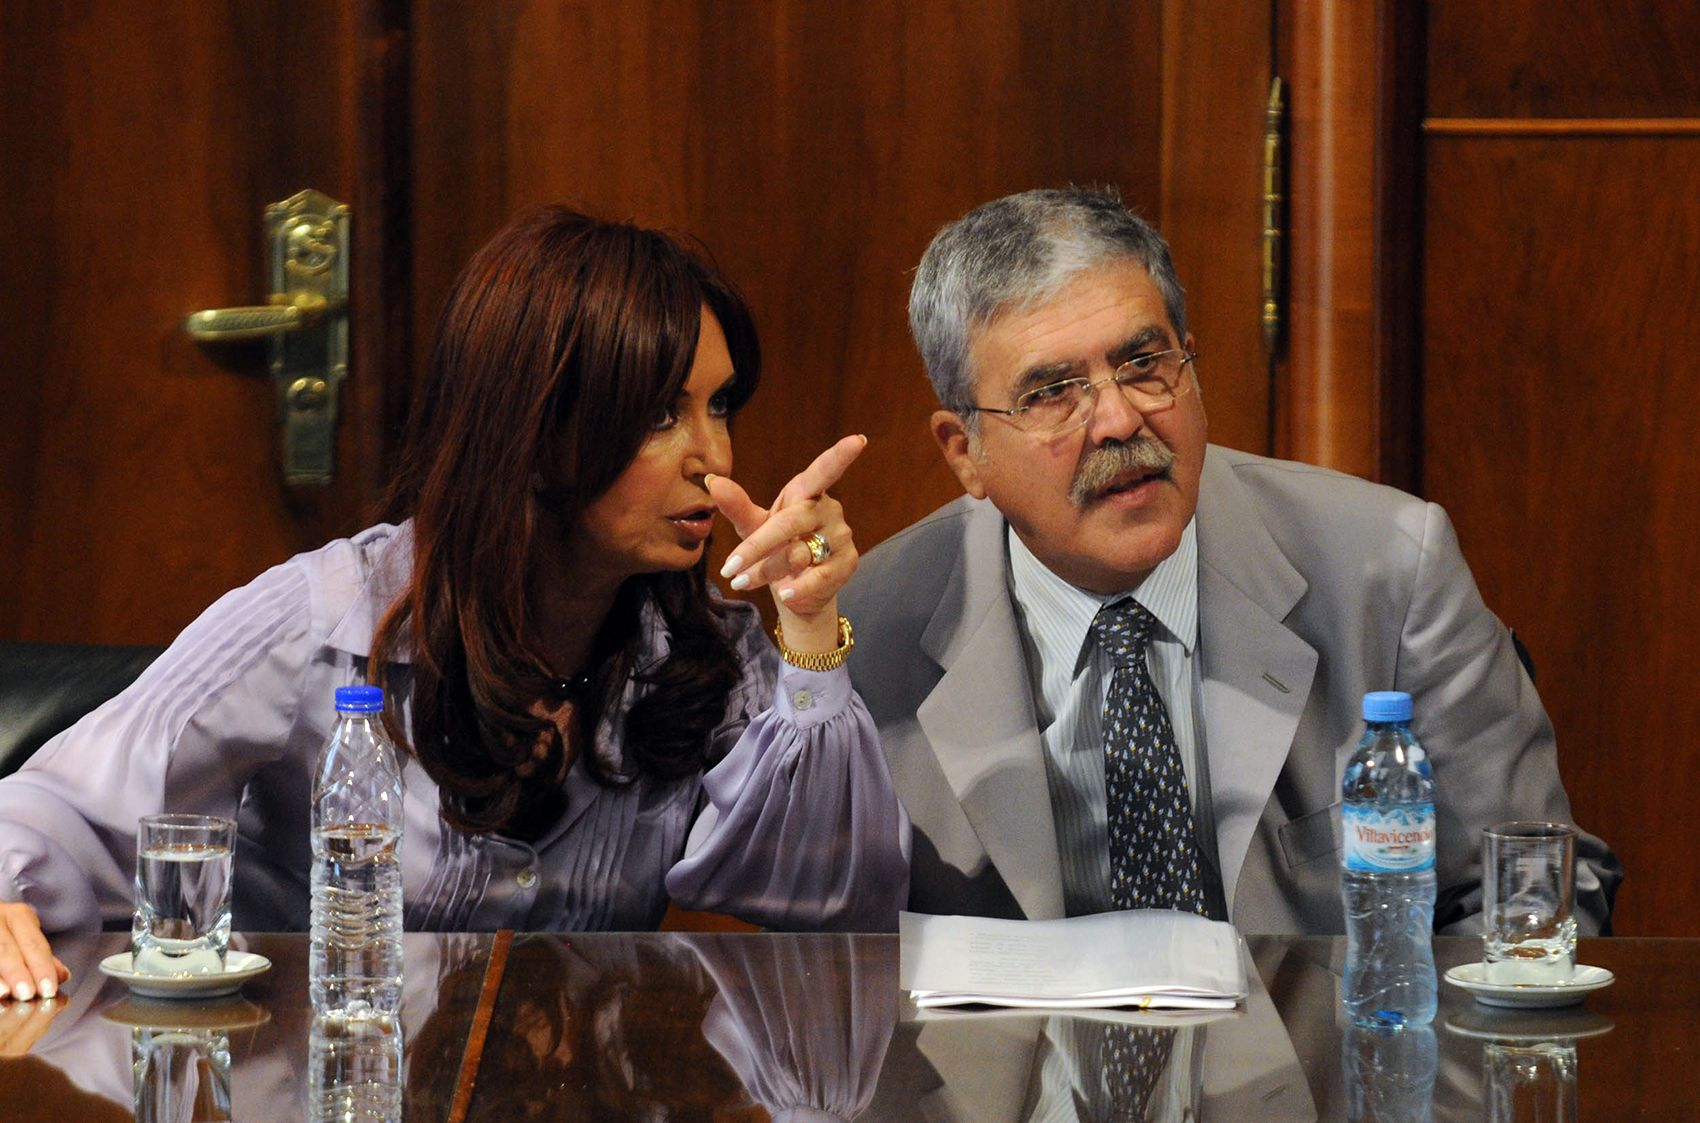 <p>Cristina Kirchner y Julio De Vido</p>